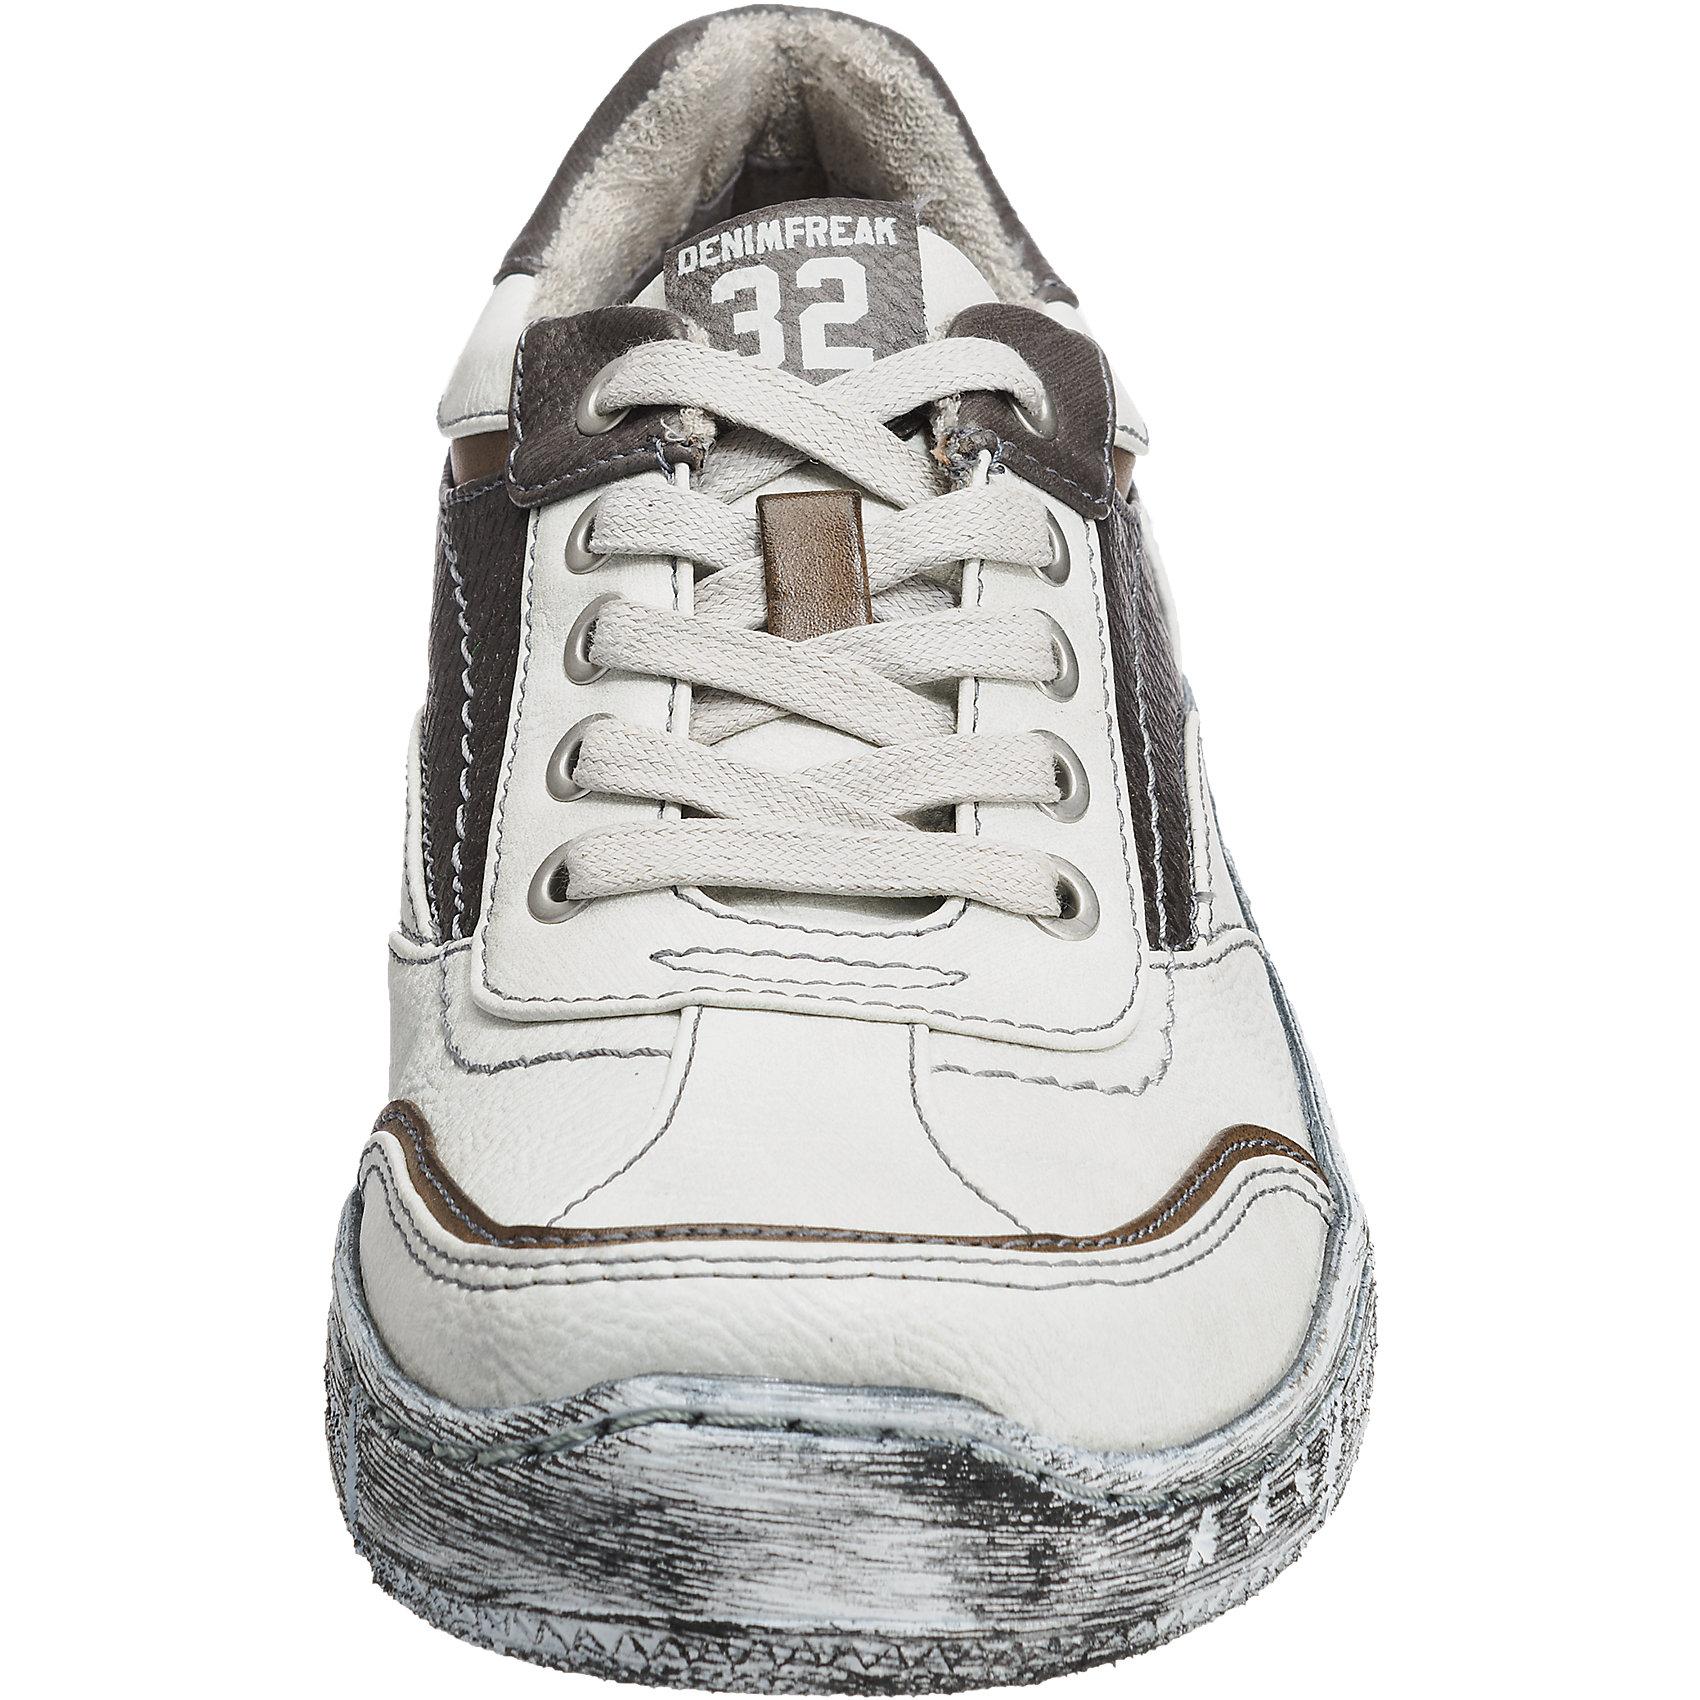 kombi Weiß Mustang Neu 5764323 Sneakers jqzLVUMGSp